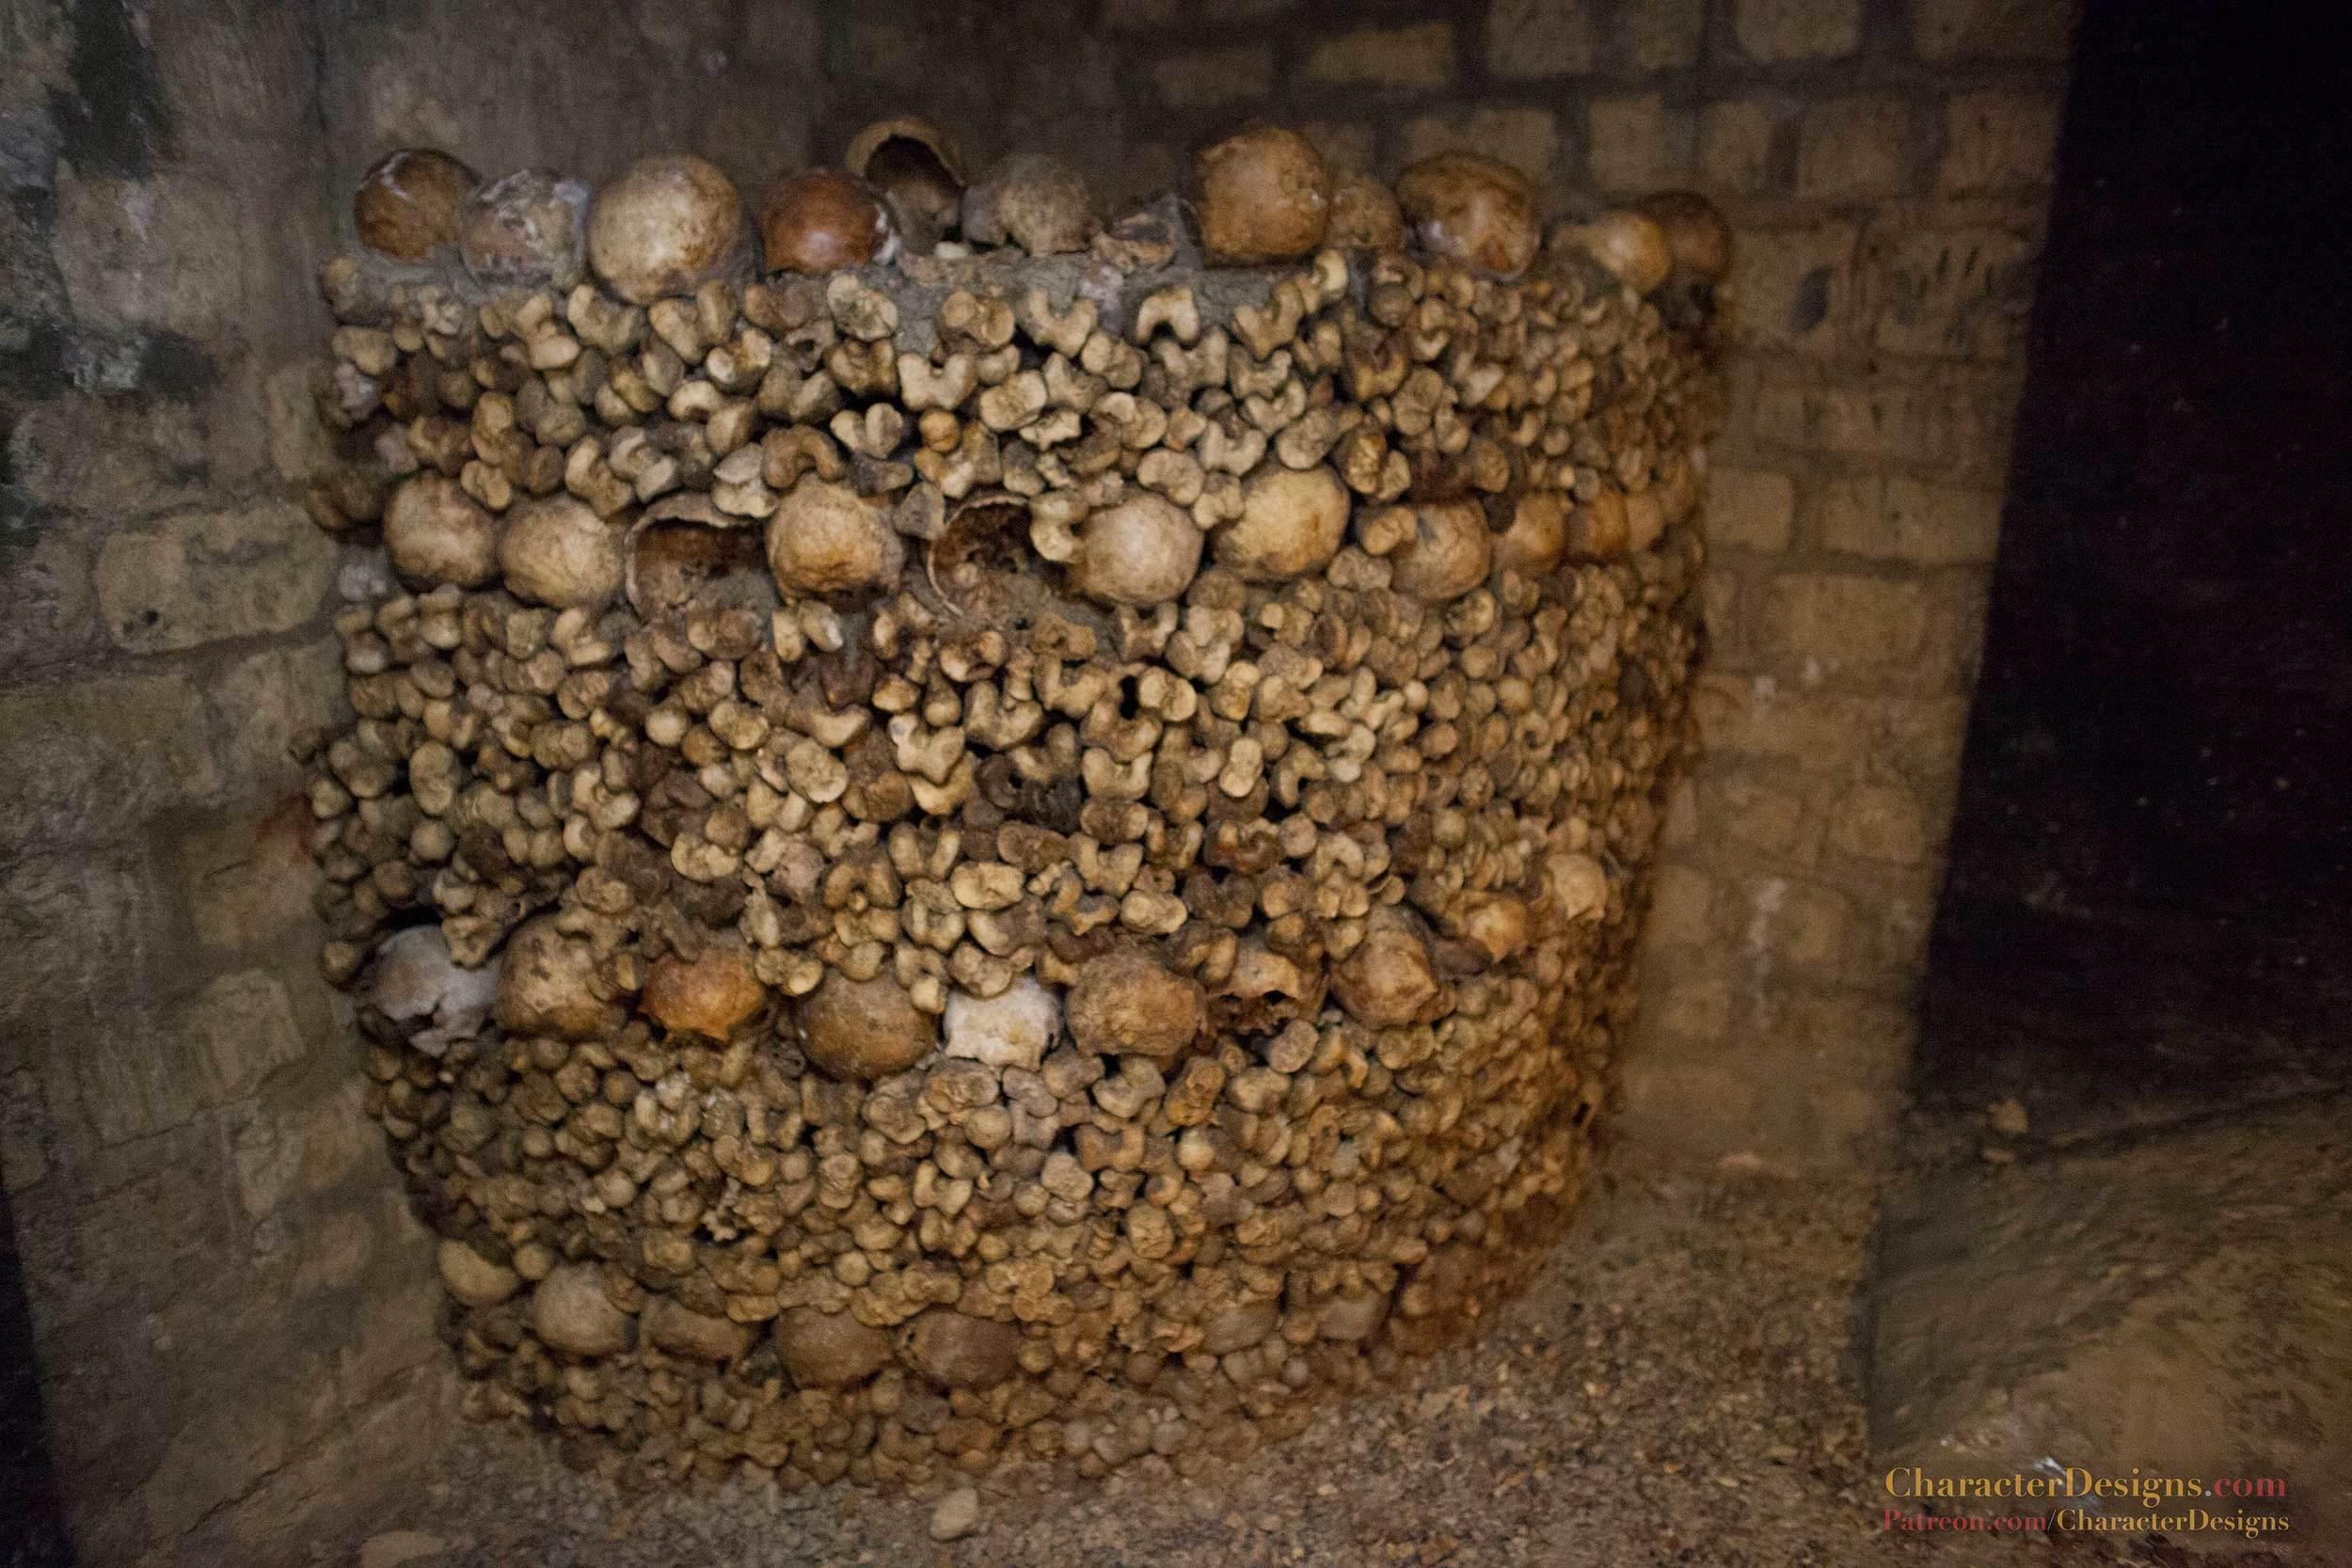 Catacombs_077.jpg